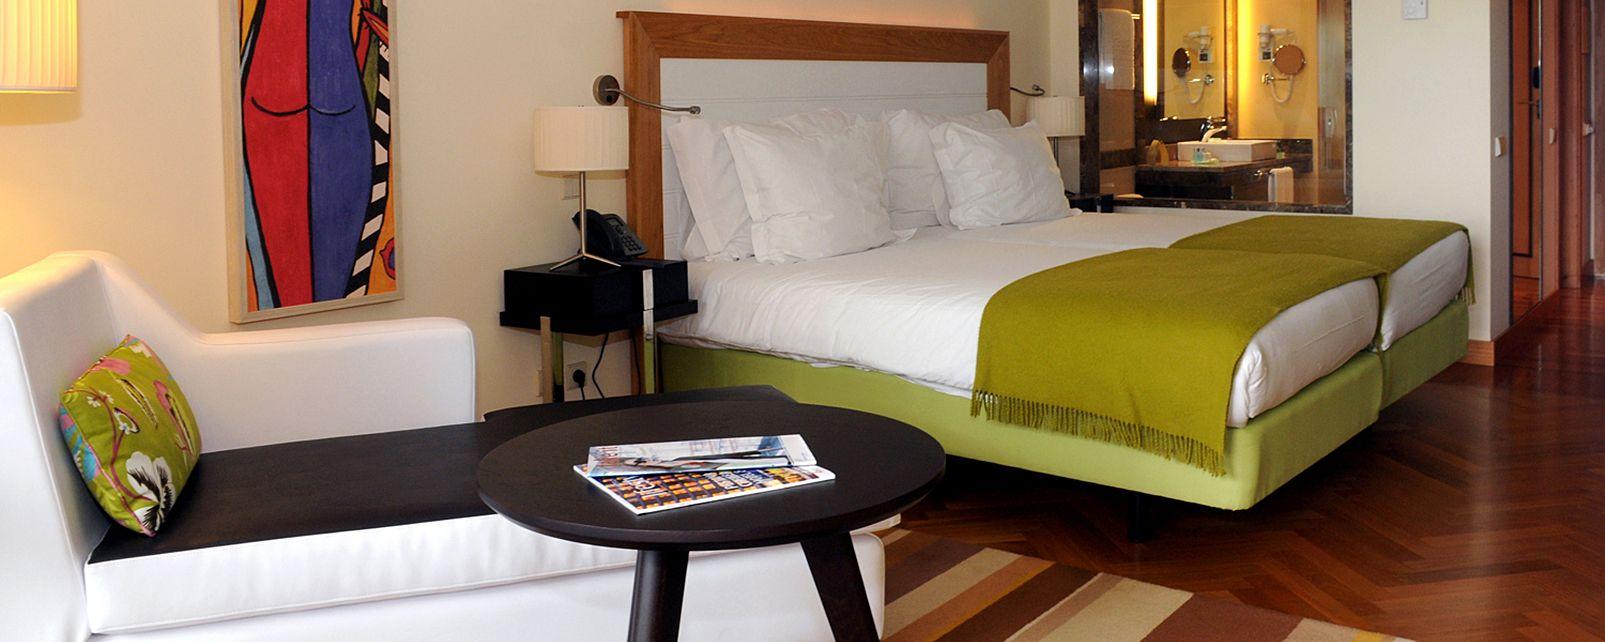 Hotel Pestana Promenade Ocean Resort Hotel